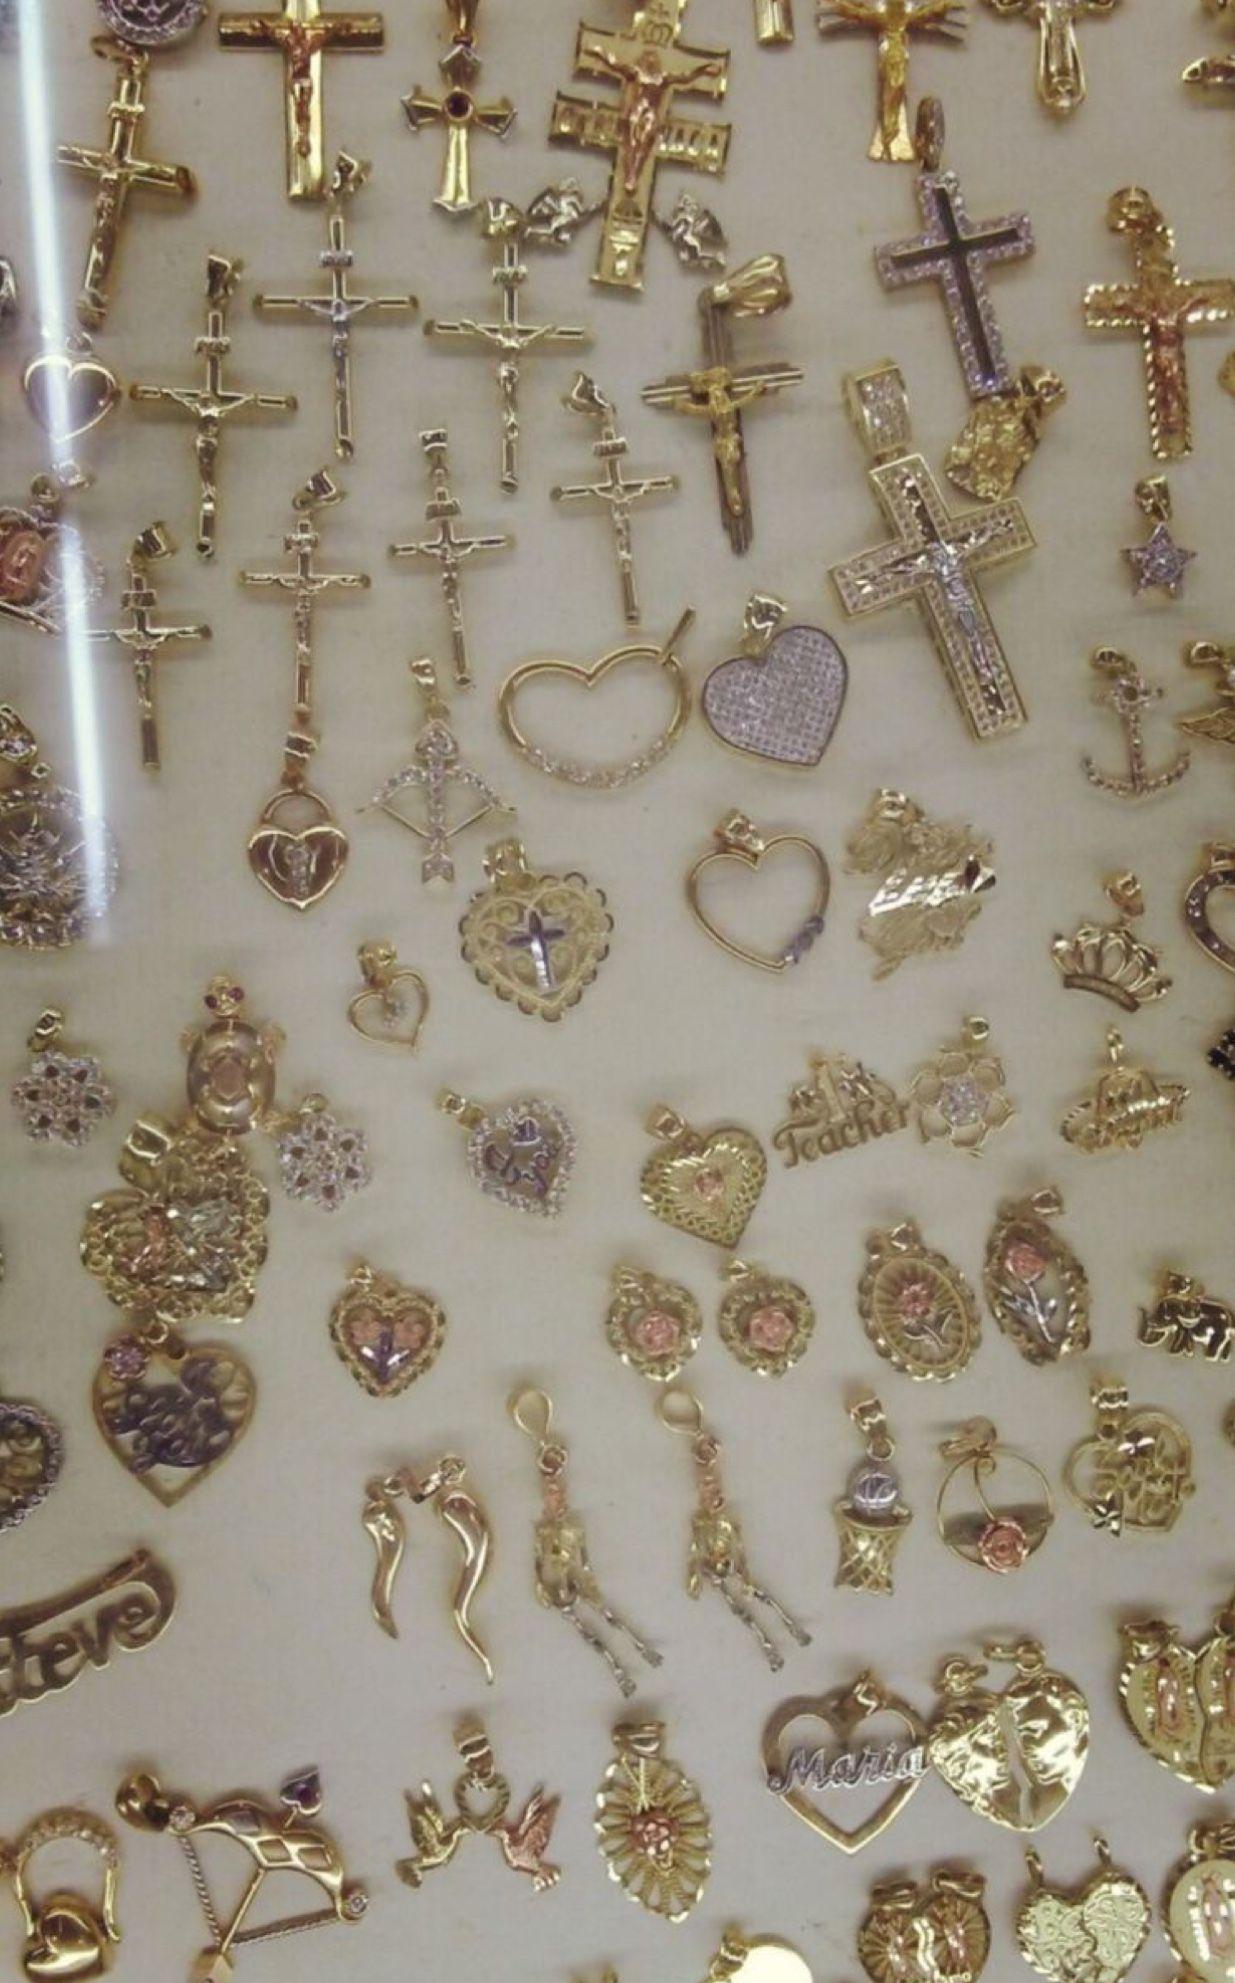 339afcd0a2b61 Pin de bxtchtales em ✨j e w e l l e r y✨ em 2019   Jewelry accessories,  Jewelry e Jewelery